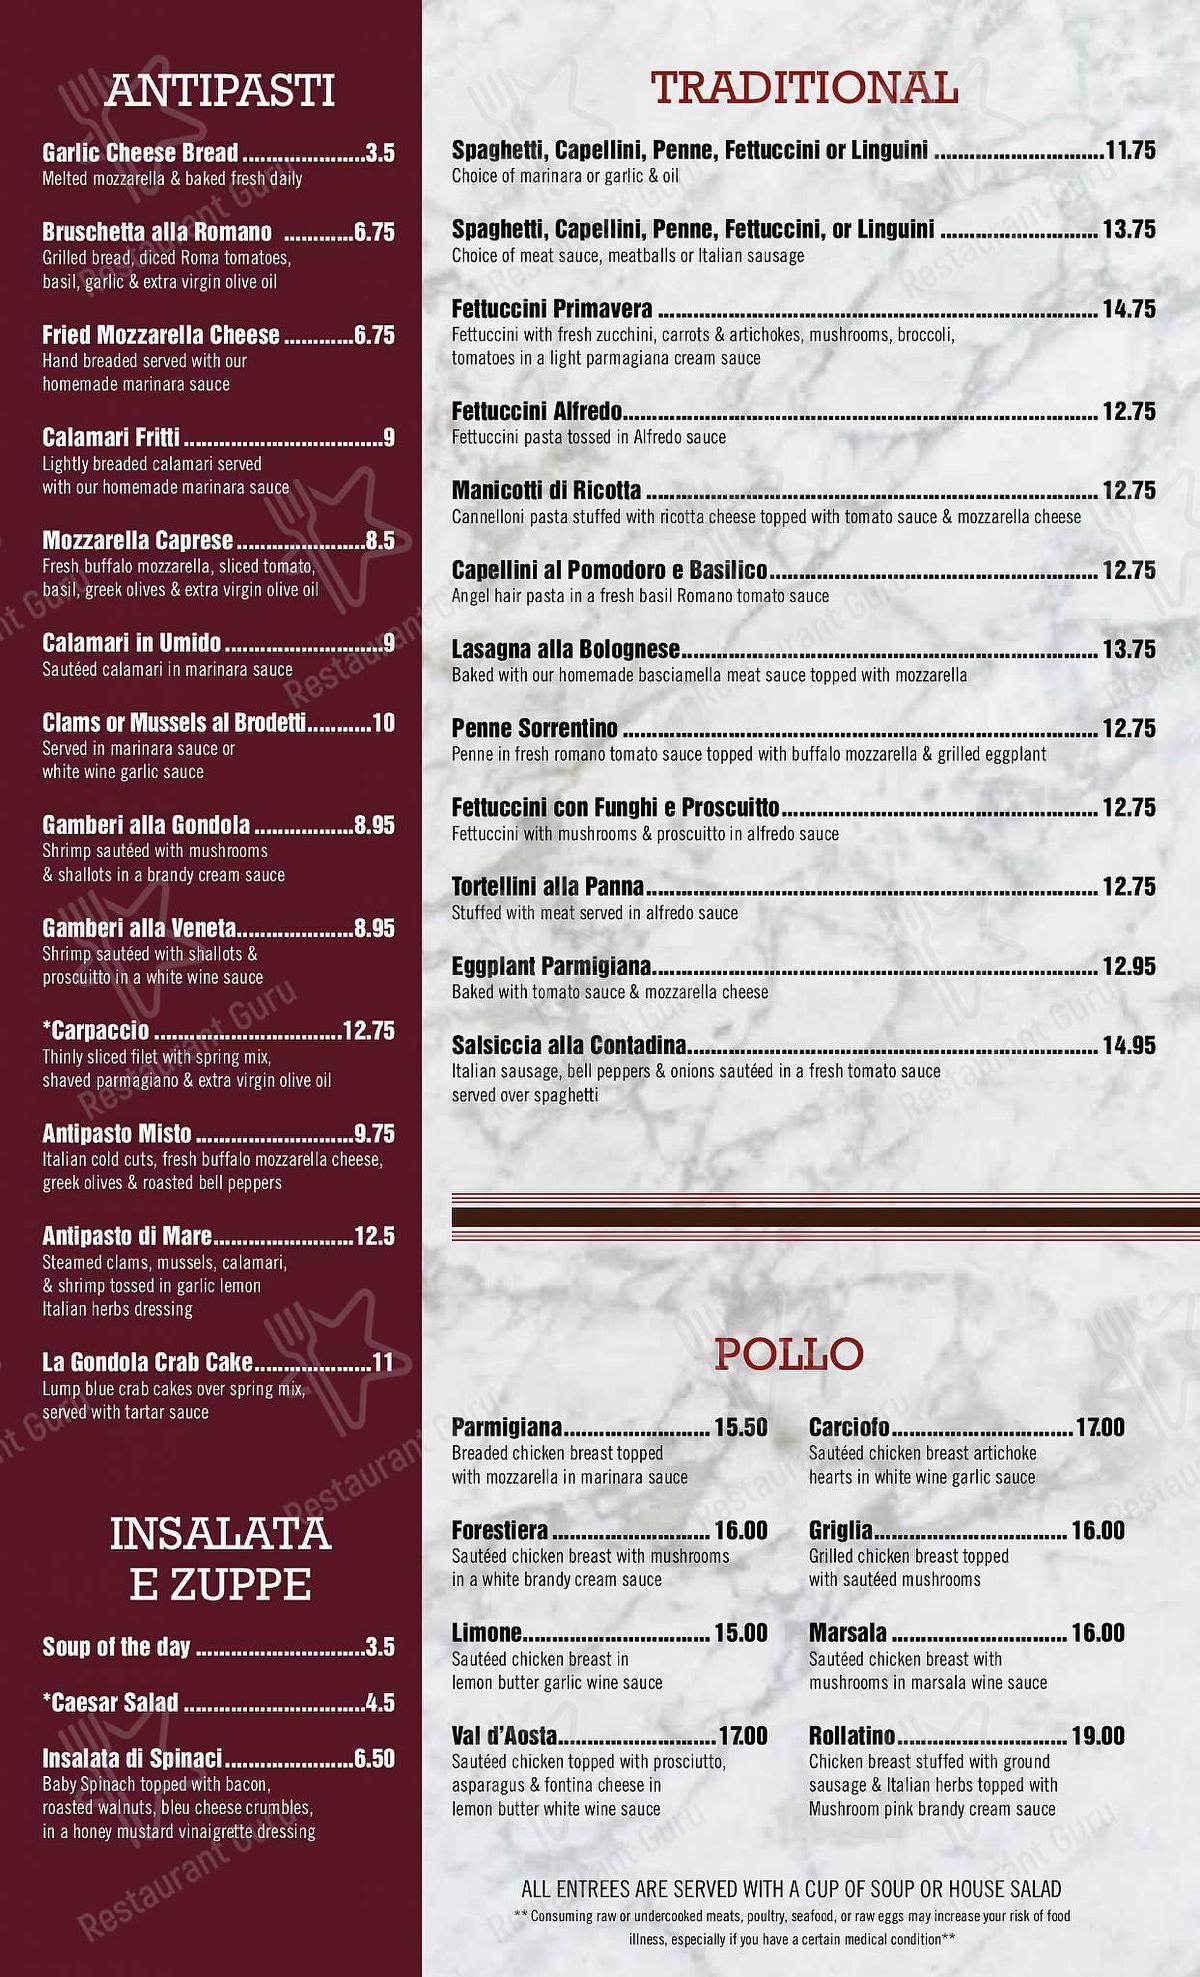 Dinner Menu for the La Gondola pub & bar